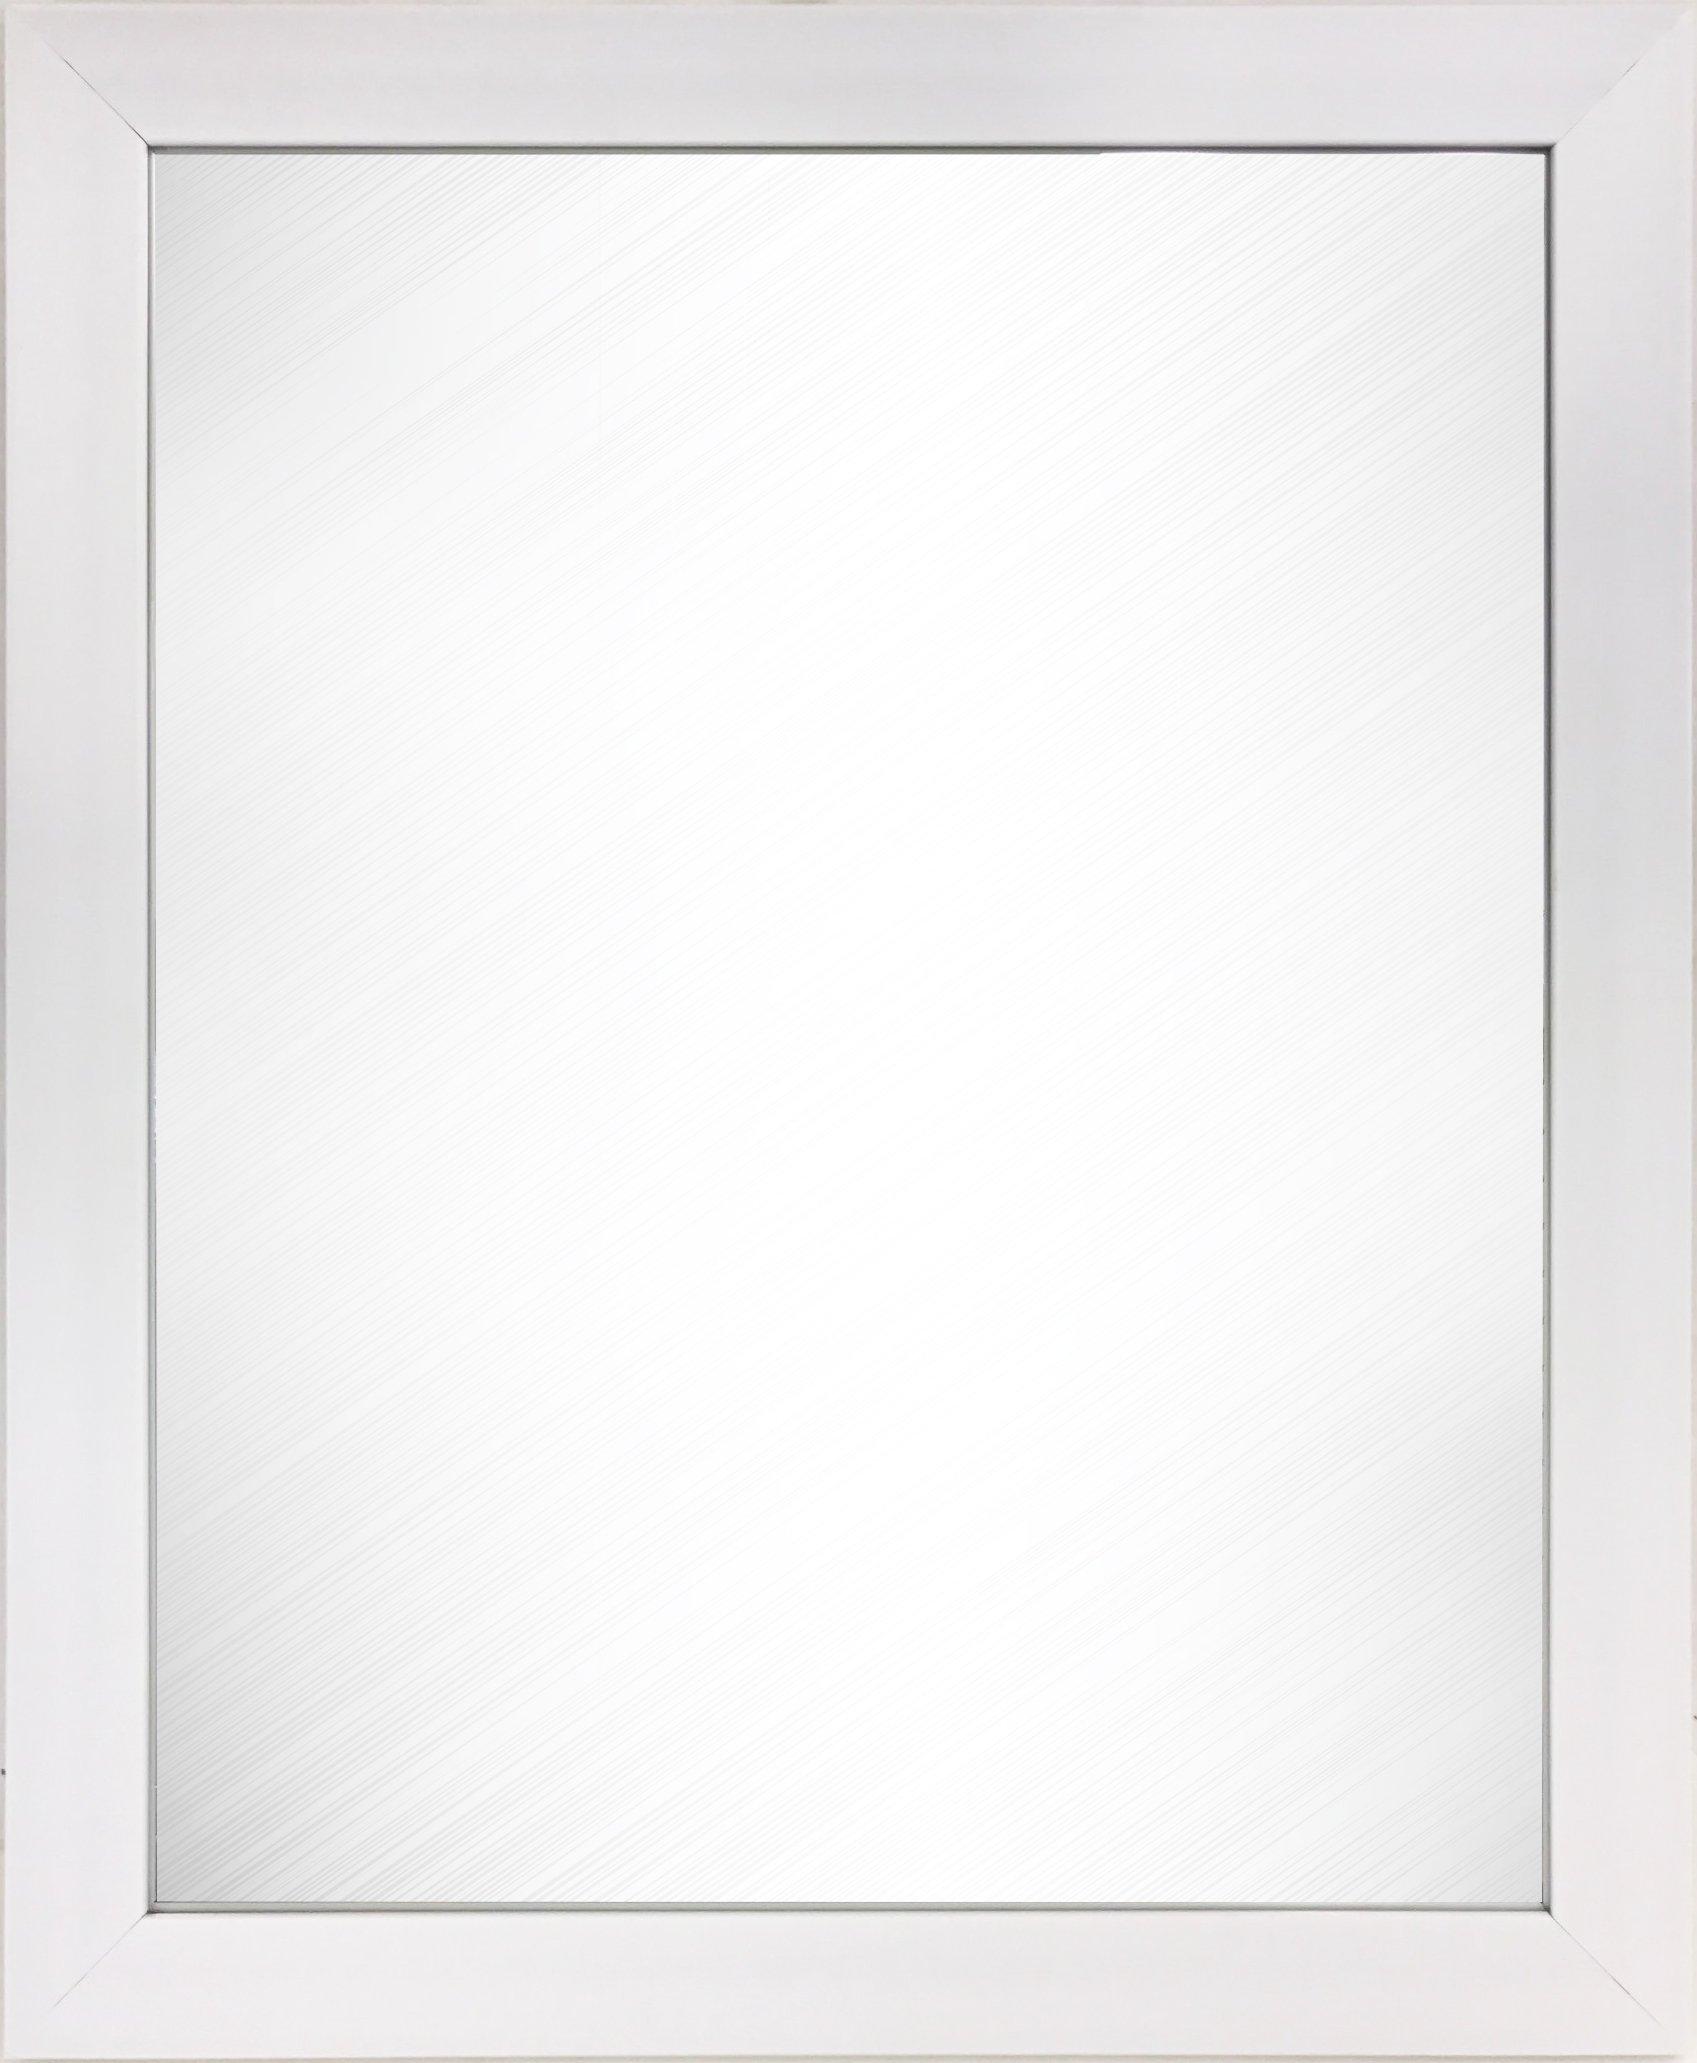 Wee's Beyond 2871WHITE 2871white Wee's beyond 2871white Wall Mount Rectangular Dressing Mirror White by Wee's Beyond